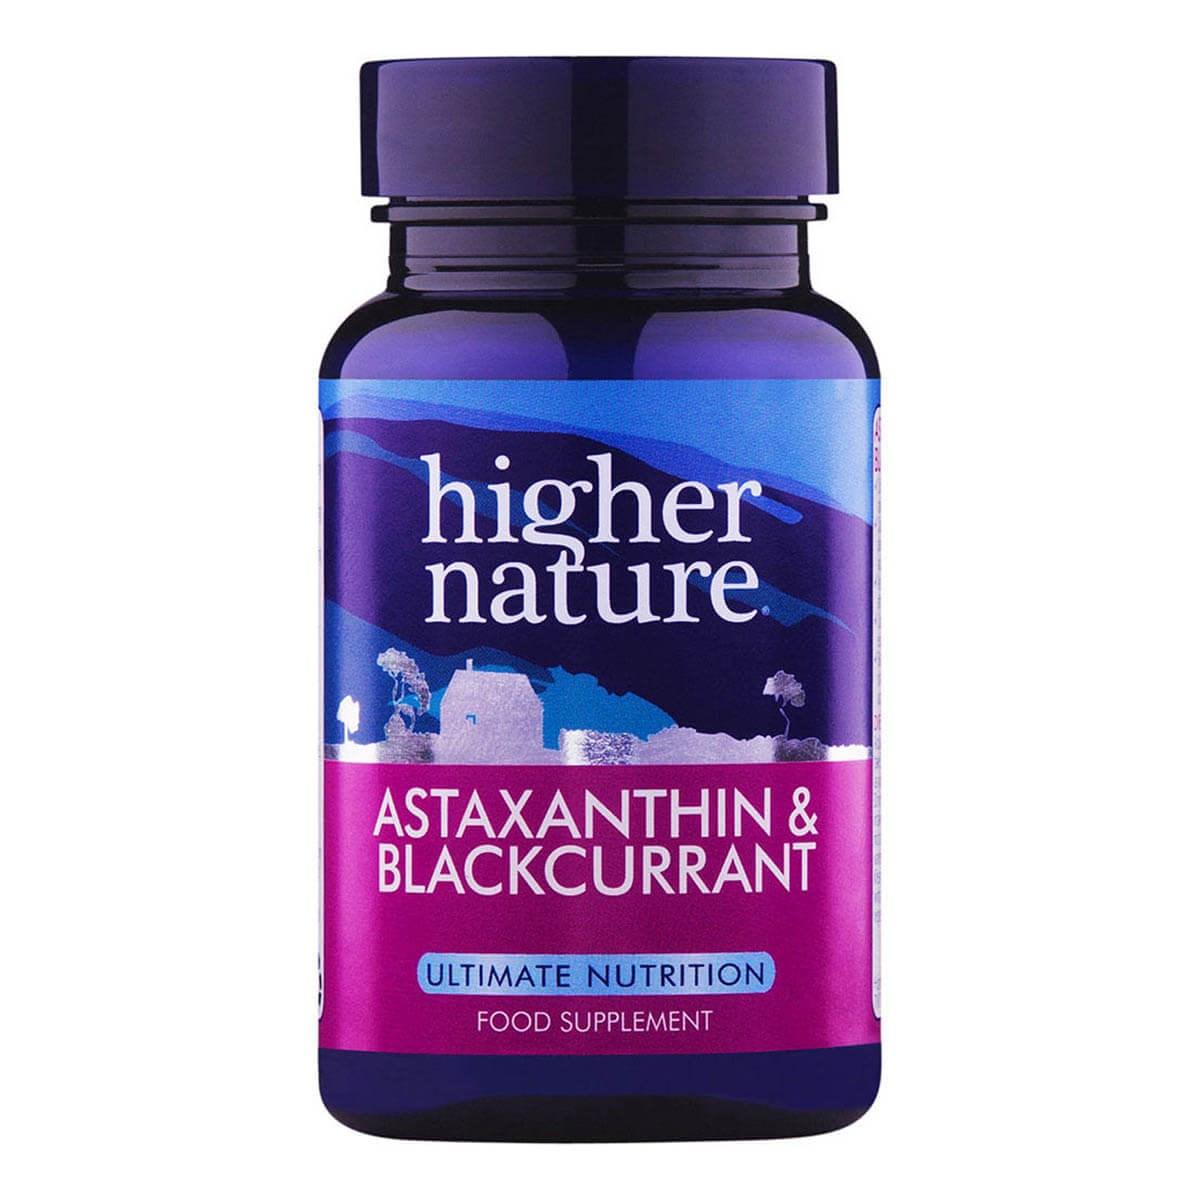 Higher Nature Astaxanthin & Blackcurrant